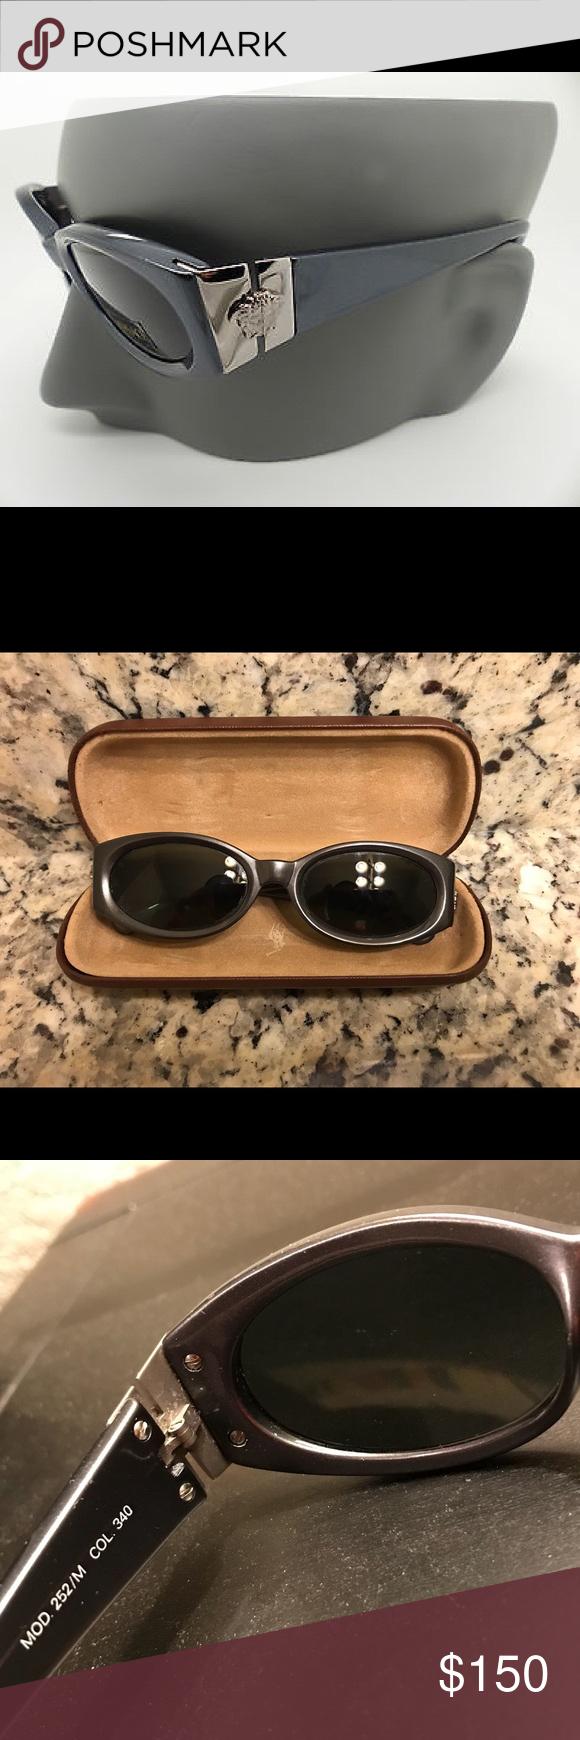 be9f7fc073 Vintage Gianni Versace Sunglasses unisex Rare Vintage  Gianni Versace   Sunglasses - Mod 252